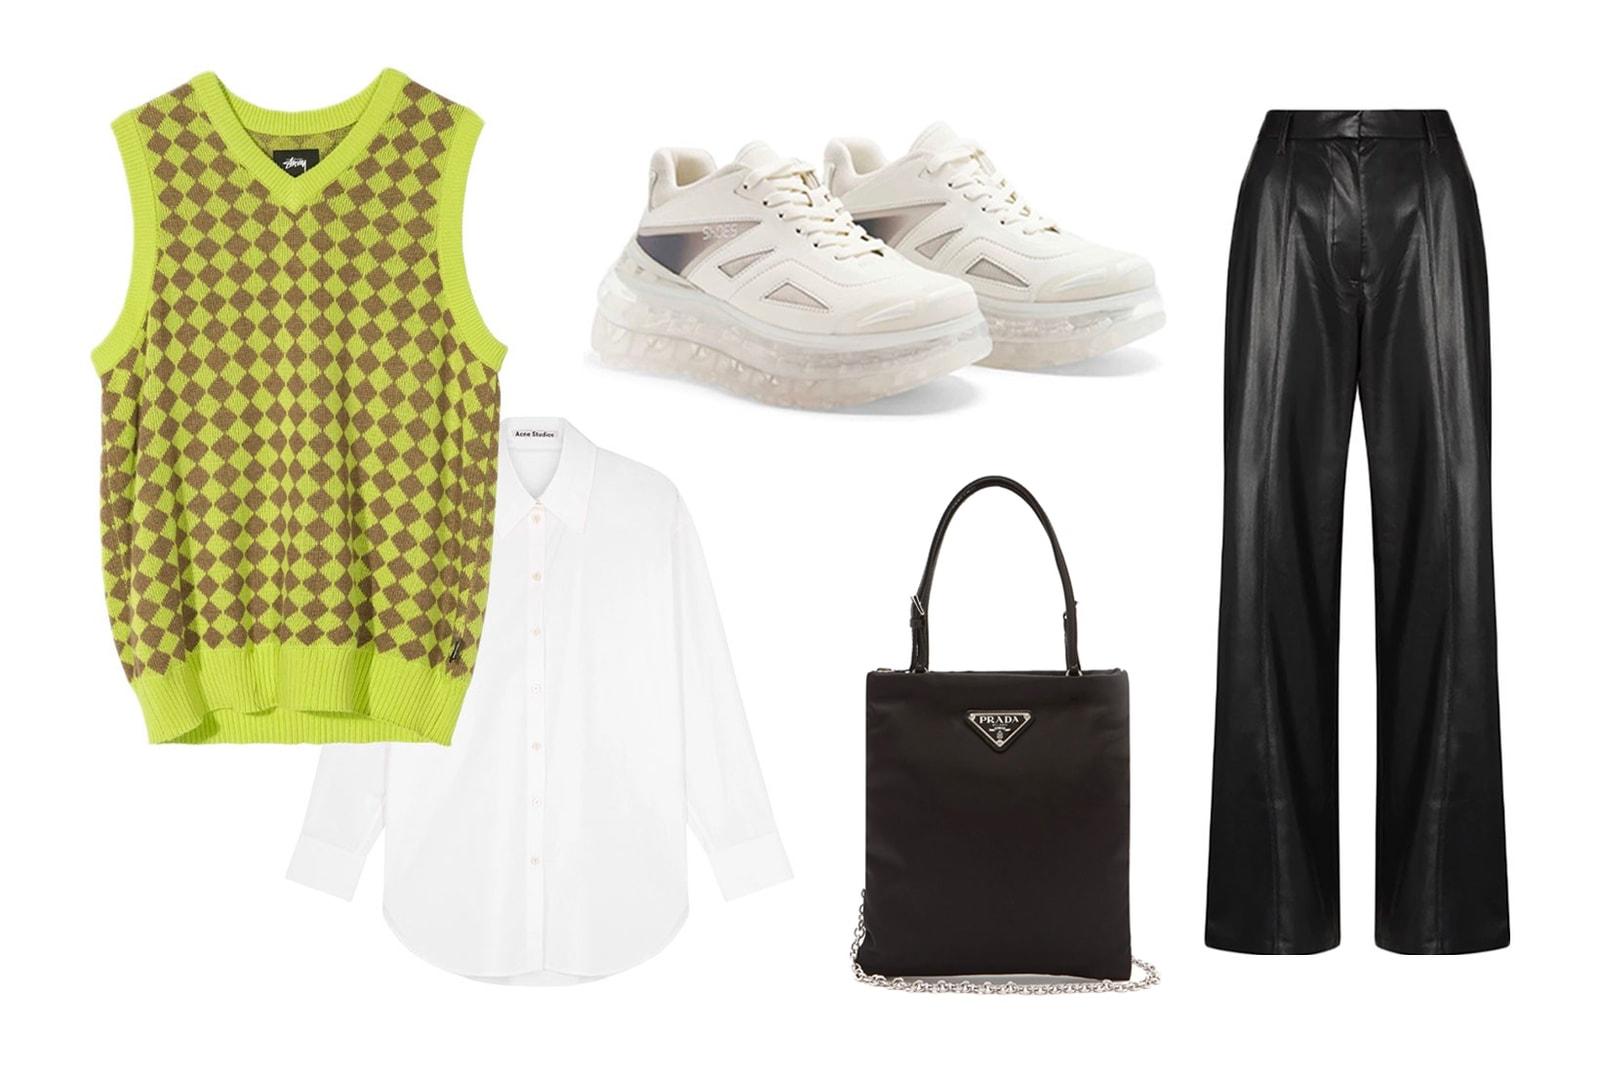 sweater knit vest outfits ideas styling stussy green checker acne studios white shirt shoes53045 bumpair nanushka leather trousers jil sander mini bag